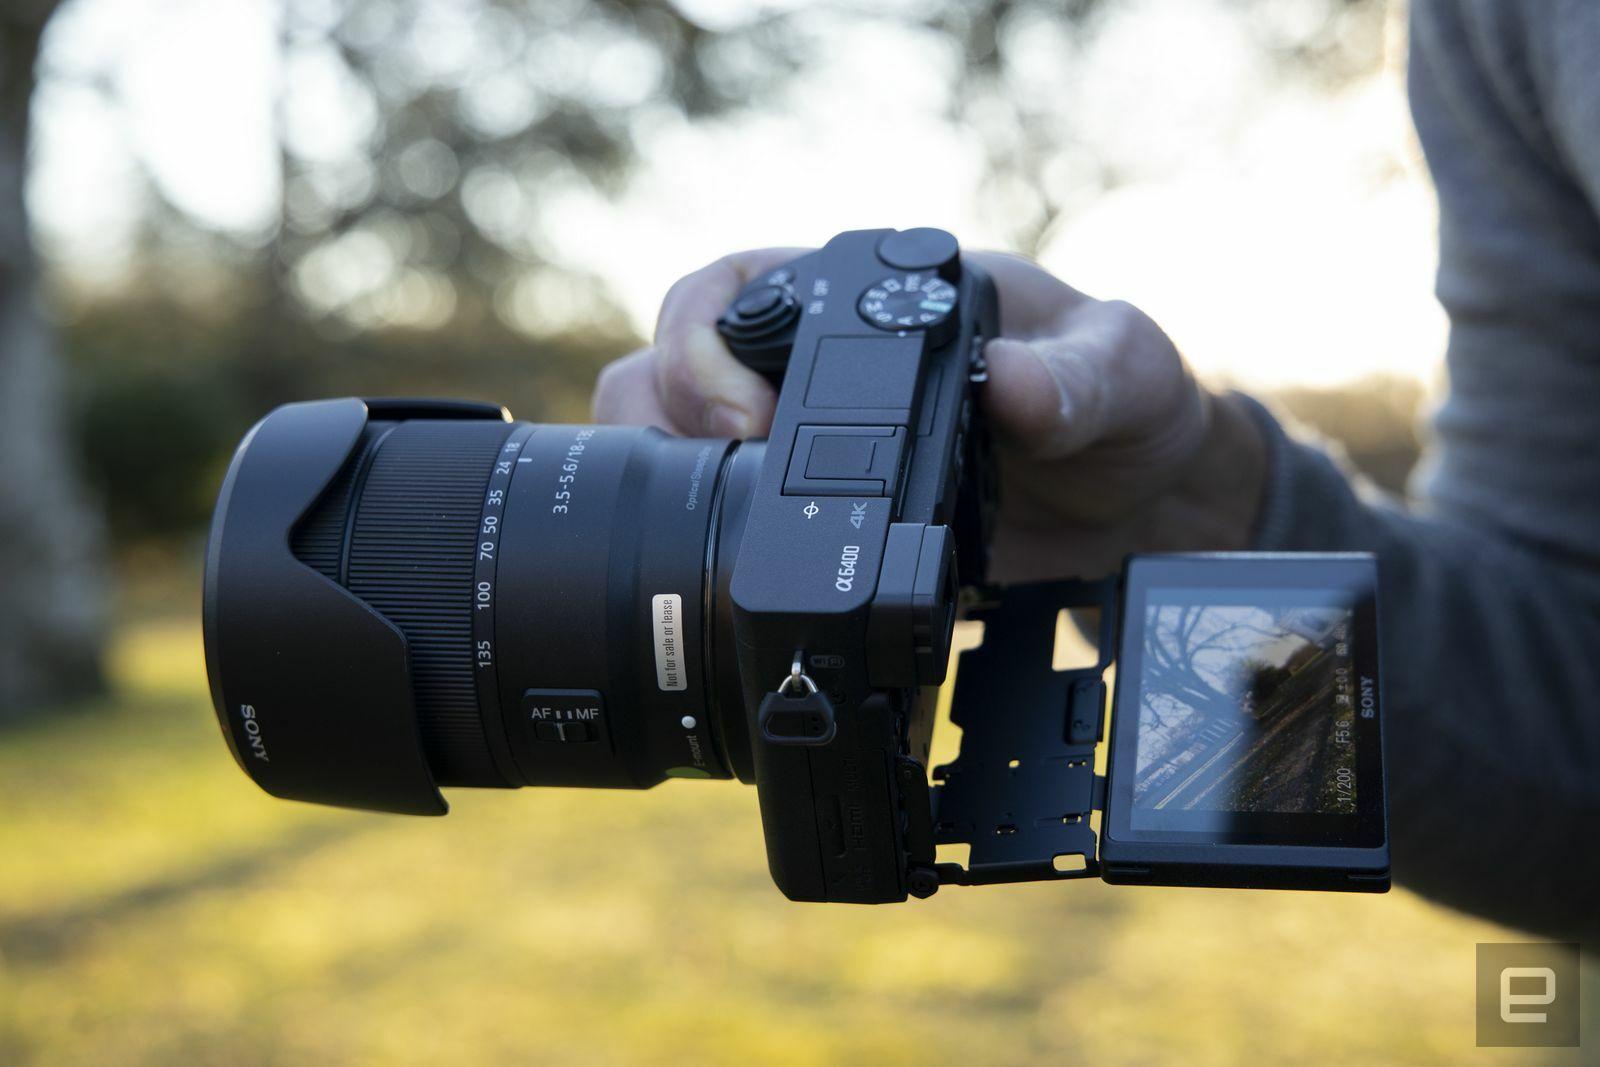 sony-a6400-aps-c-mirrorless-camera-5